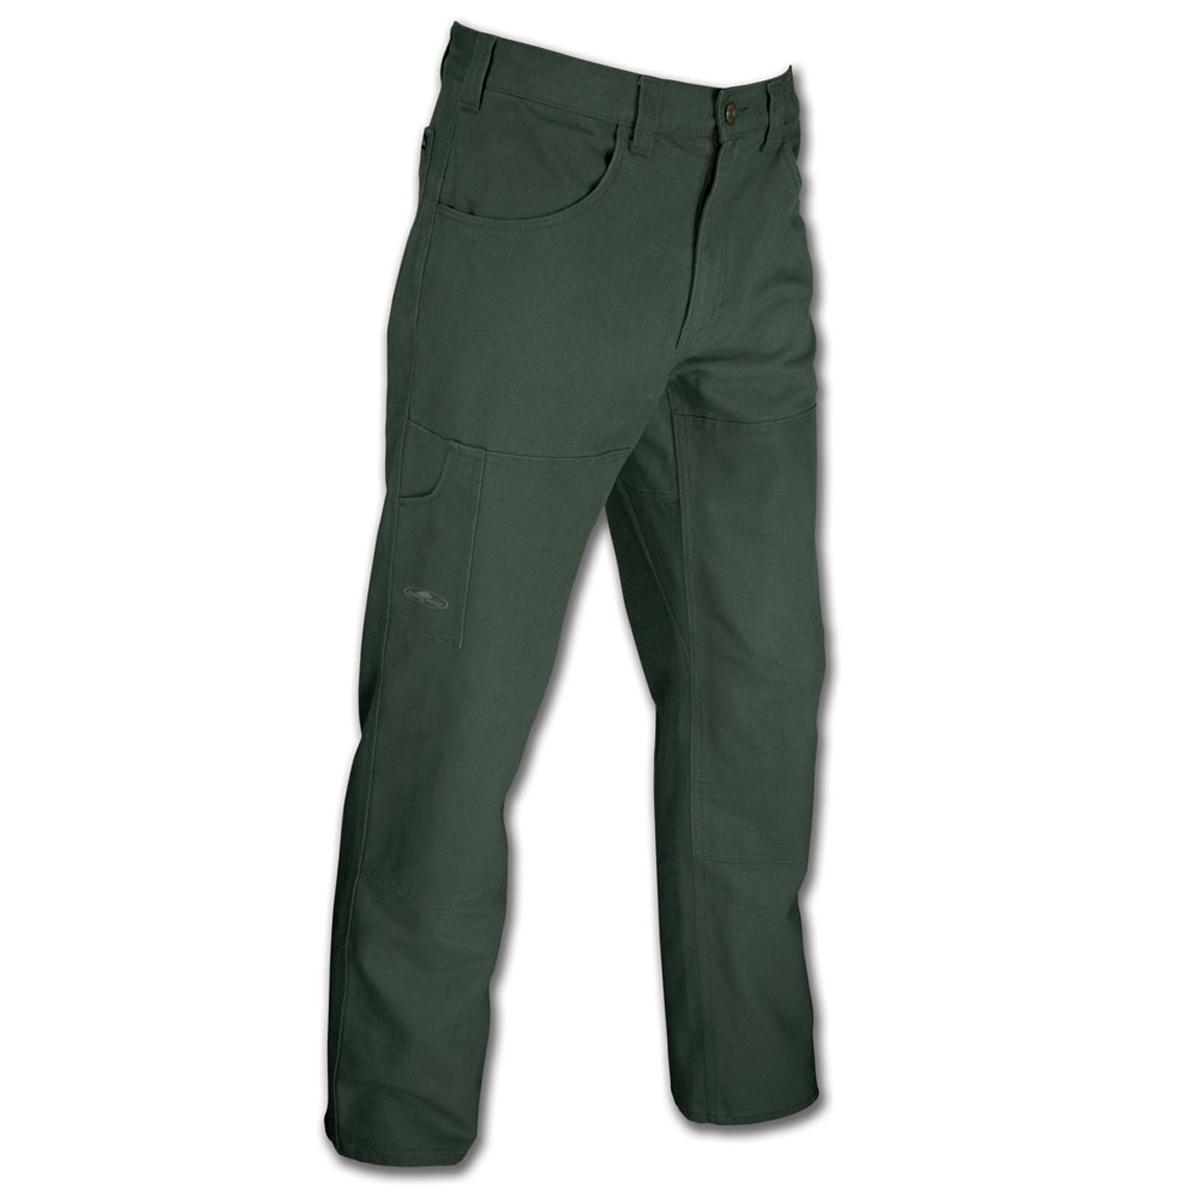 Arborwear Men's Original Tree Climber's Pants